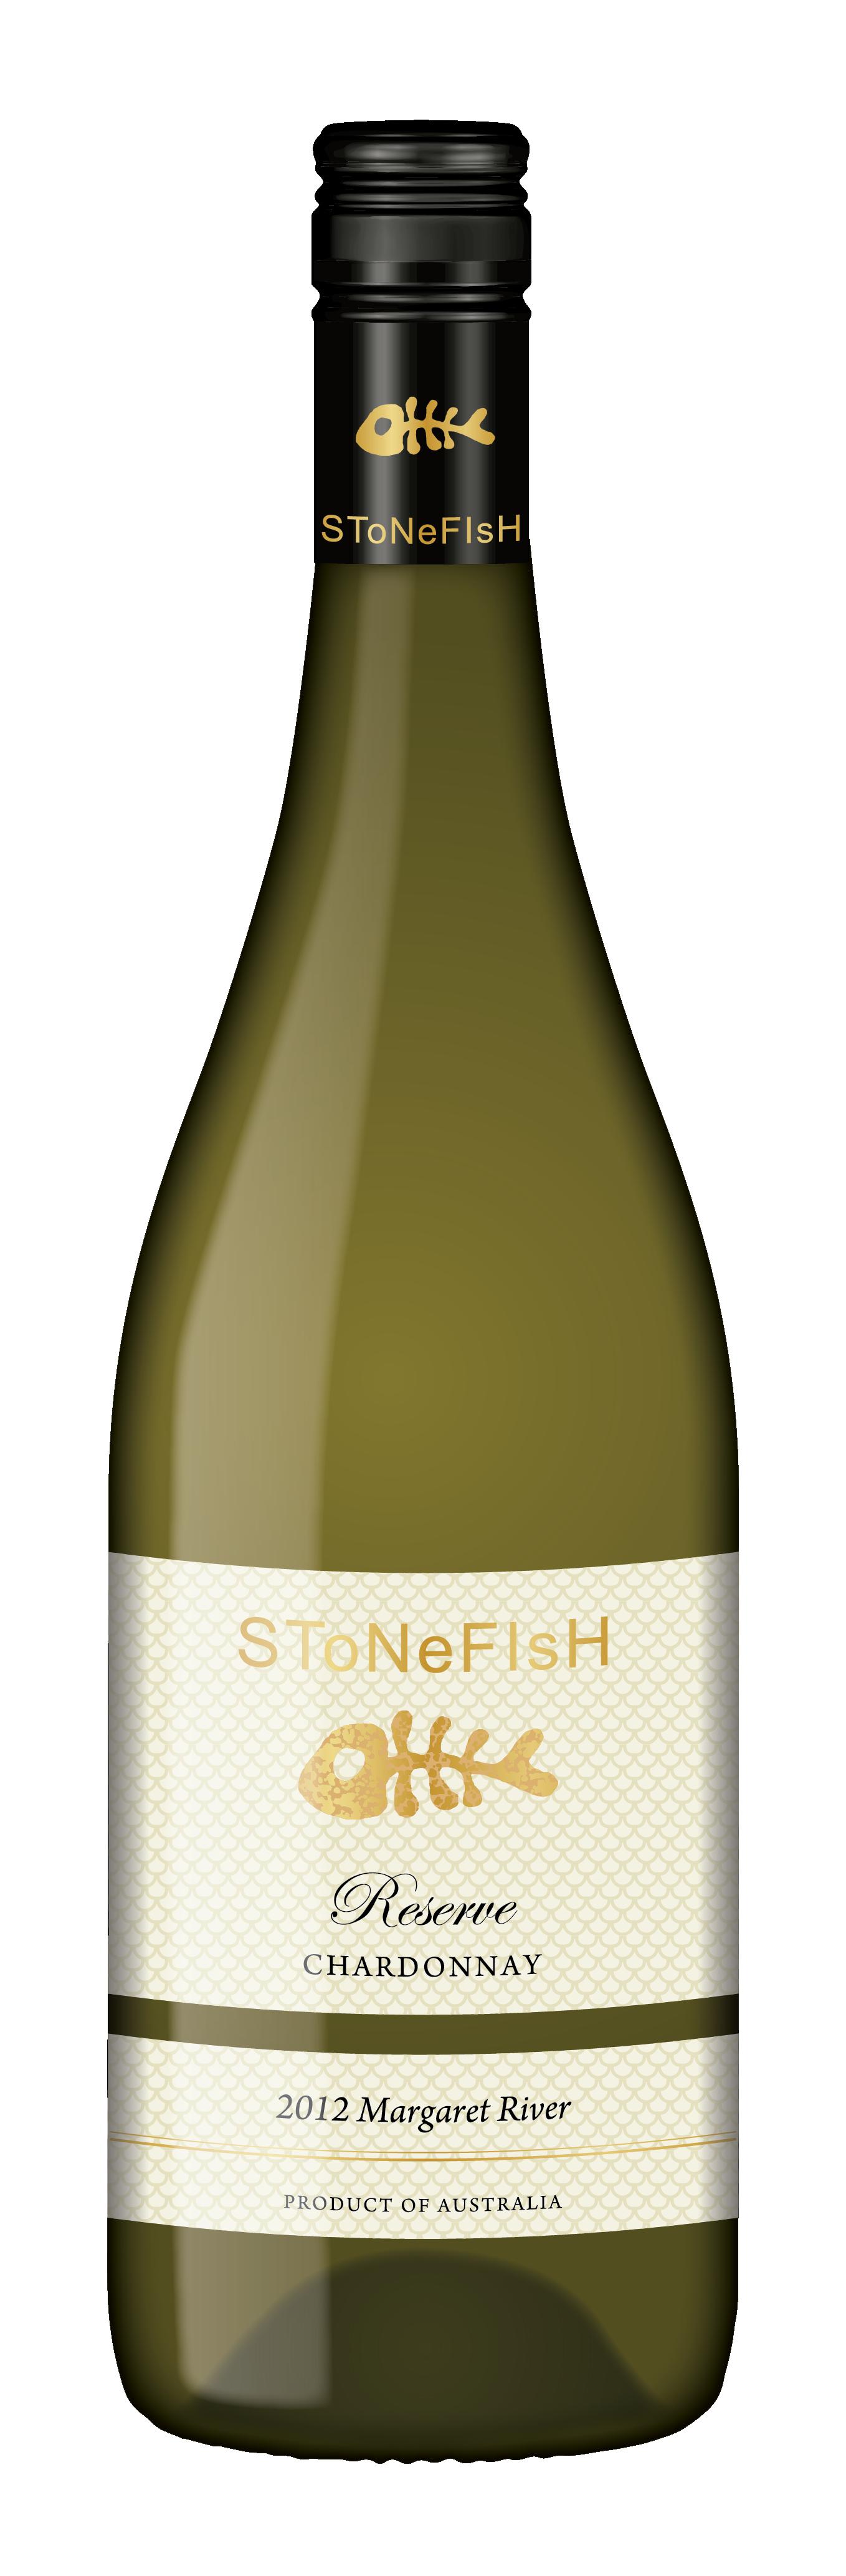 Stonefish Reserve Chardonnay 2012 Margaret River